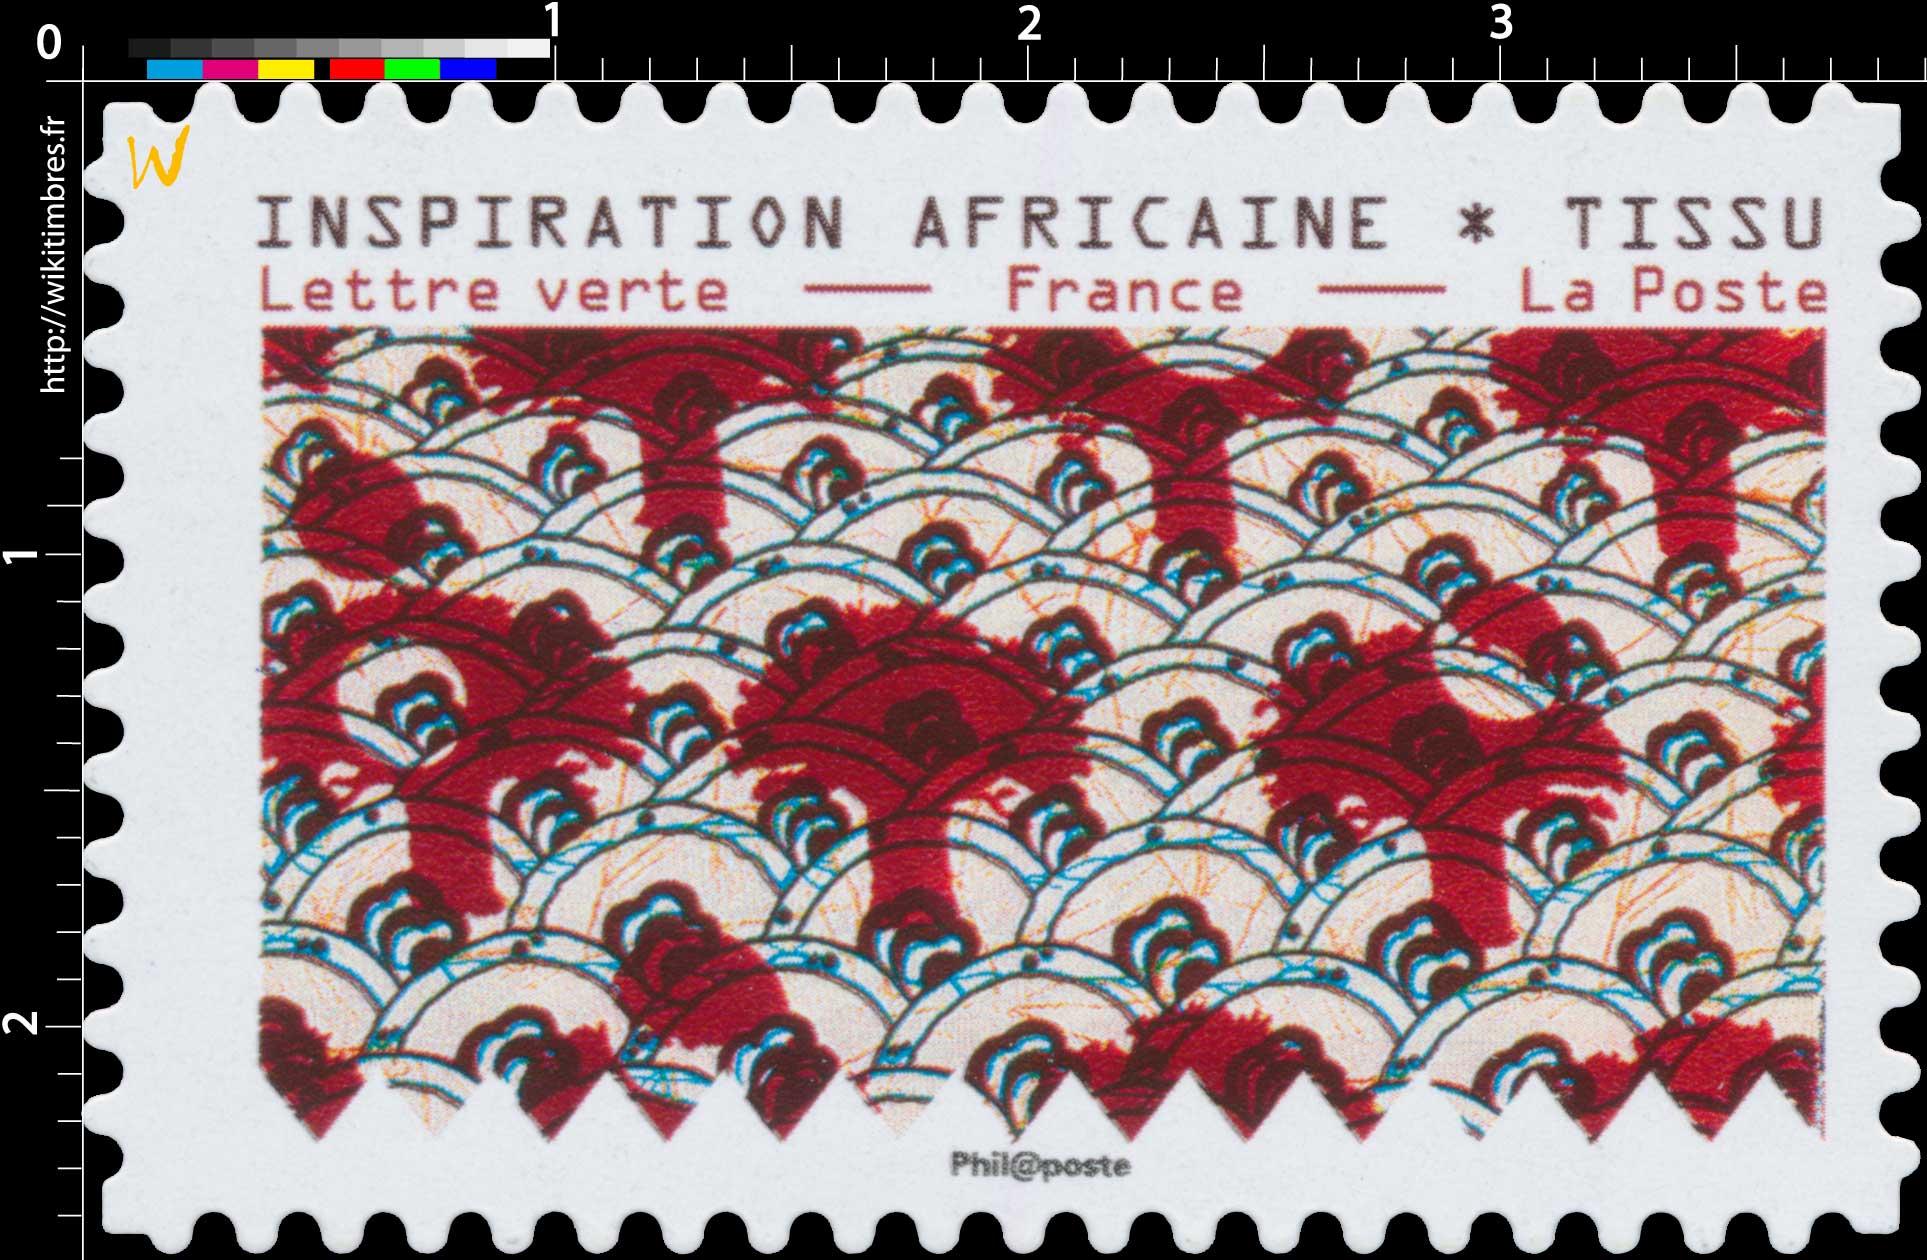 2019 Tissus motifs nature - INSPIRATION AFRICAINE